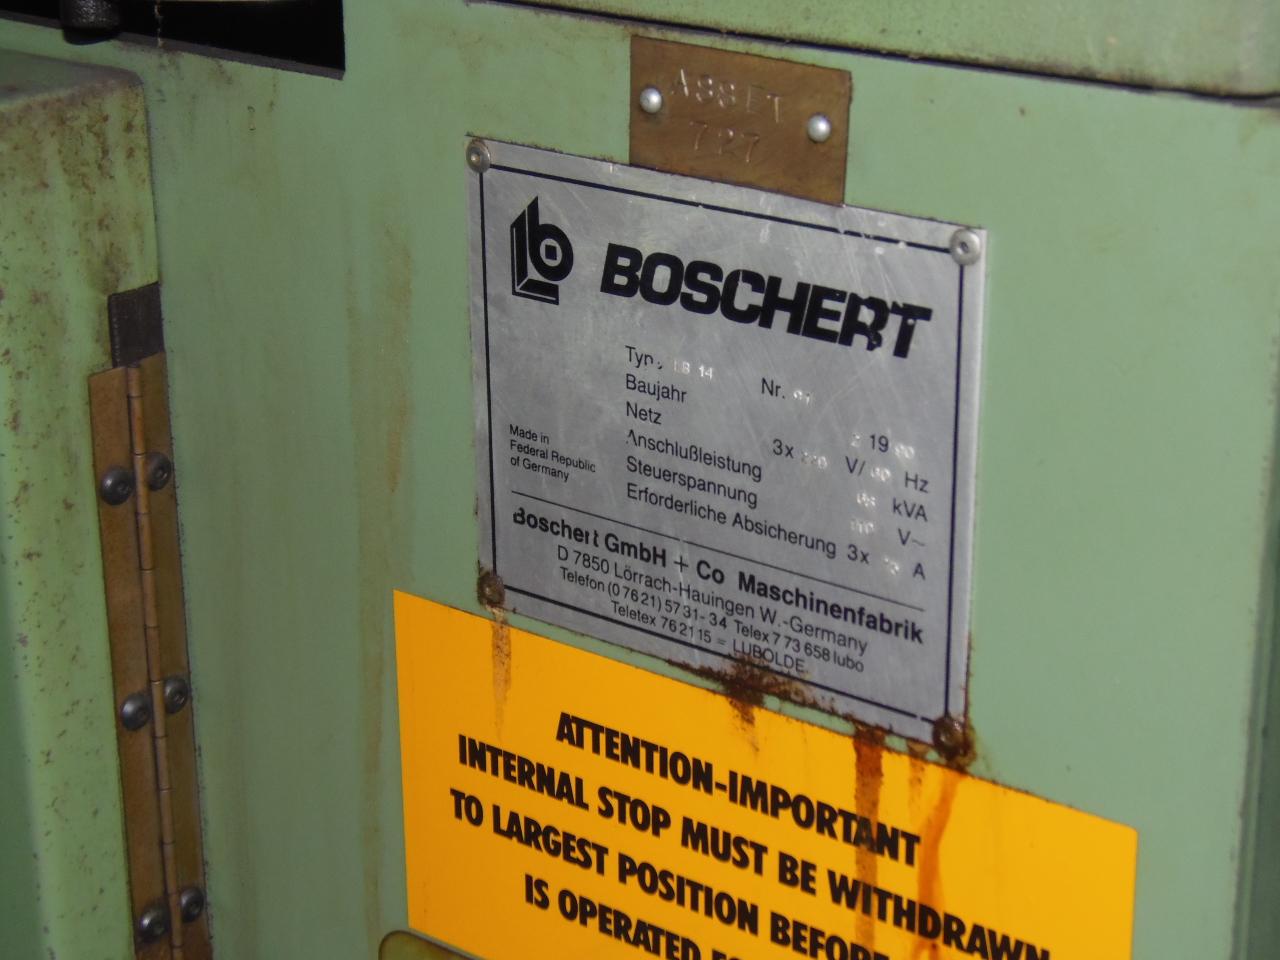 ".156 X 8.875"" X 8.875"" BOSCHERT NOTCHER, MODEL LB14, HYDRAULIC, COPING ATTACHMENT, 1996"